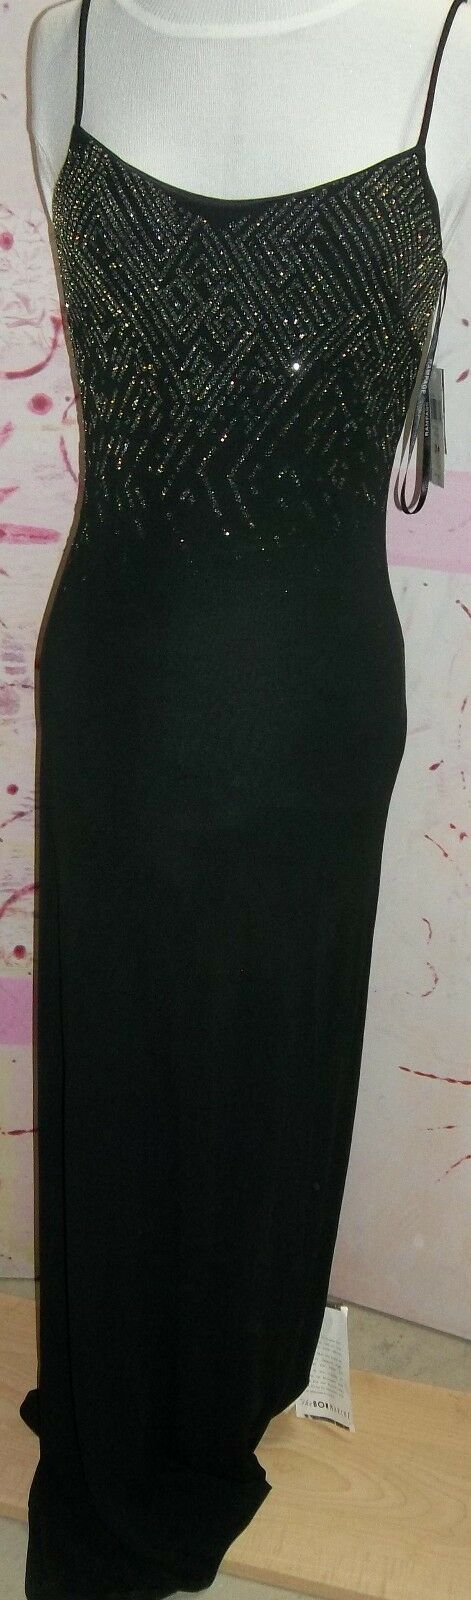 RAMPAGE  Special Occasion schwarz Beaded Dress, Spaghetti Strap,